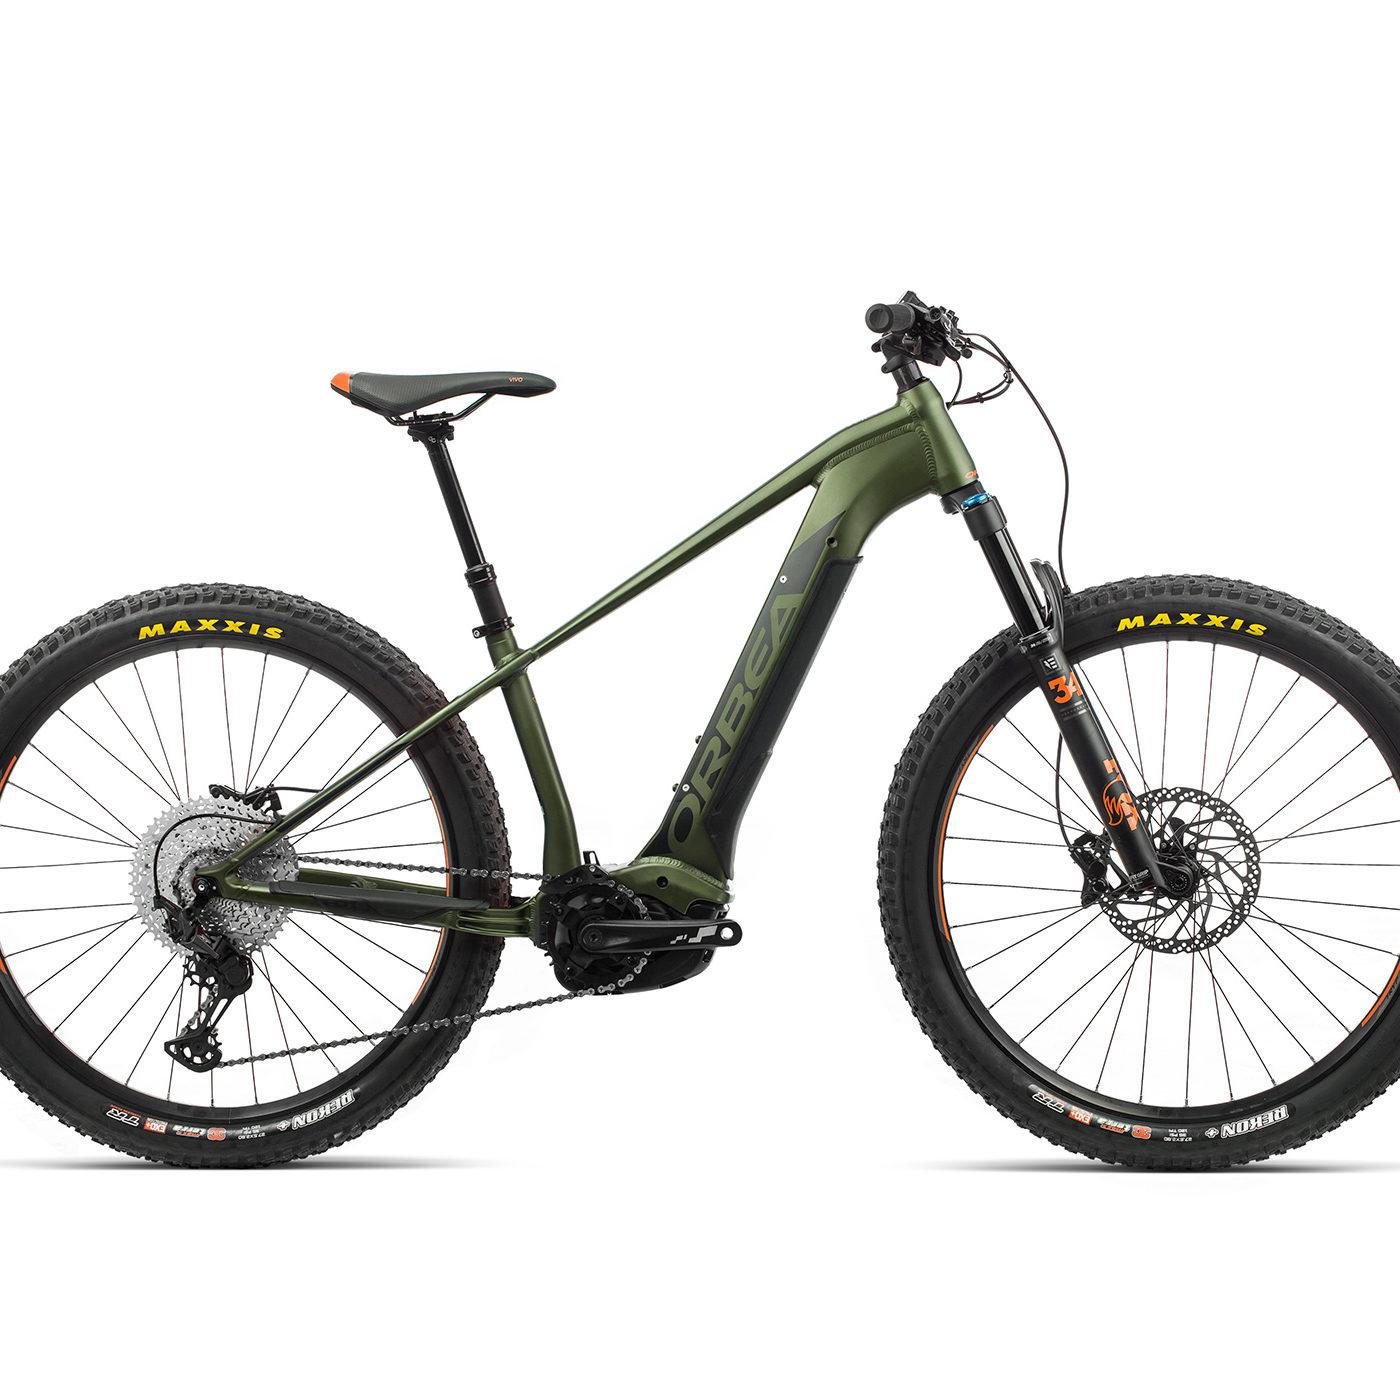 ORBEA WILD HT20 27 ebike - GROEN / ZWART (DOF) @G-Bikes